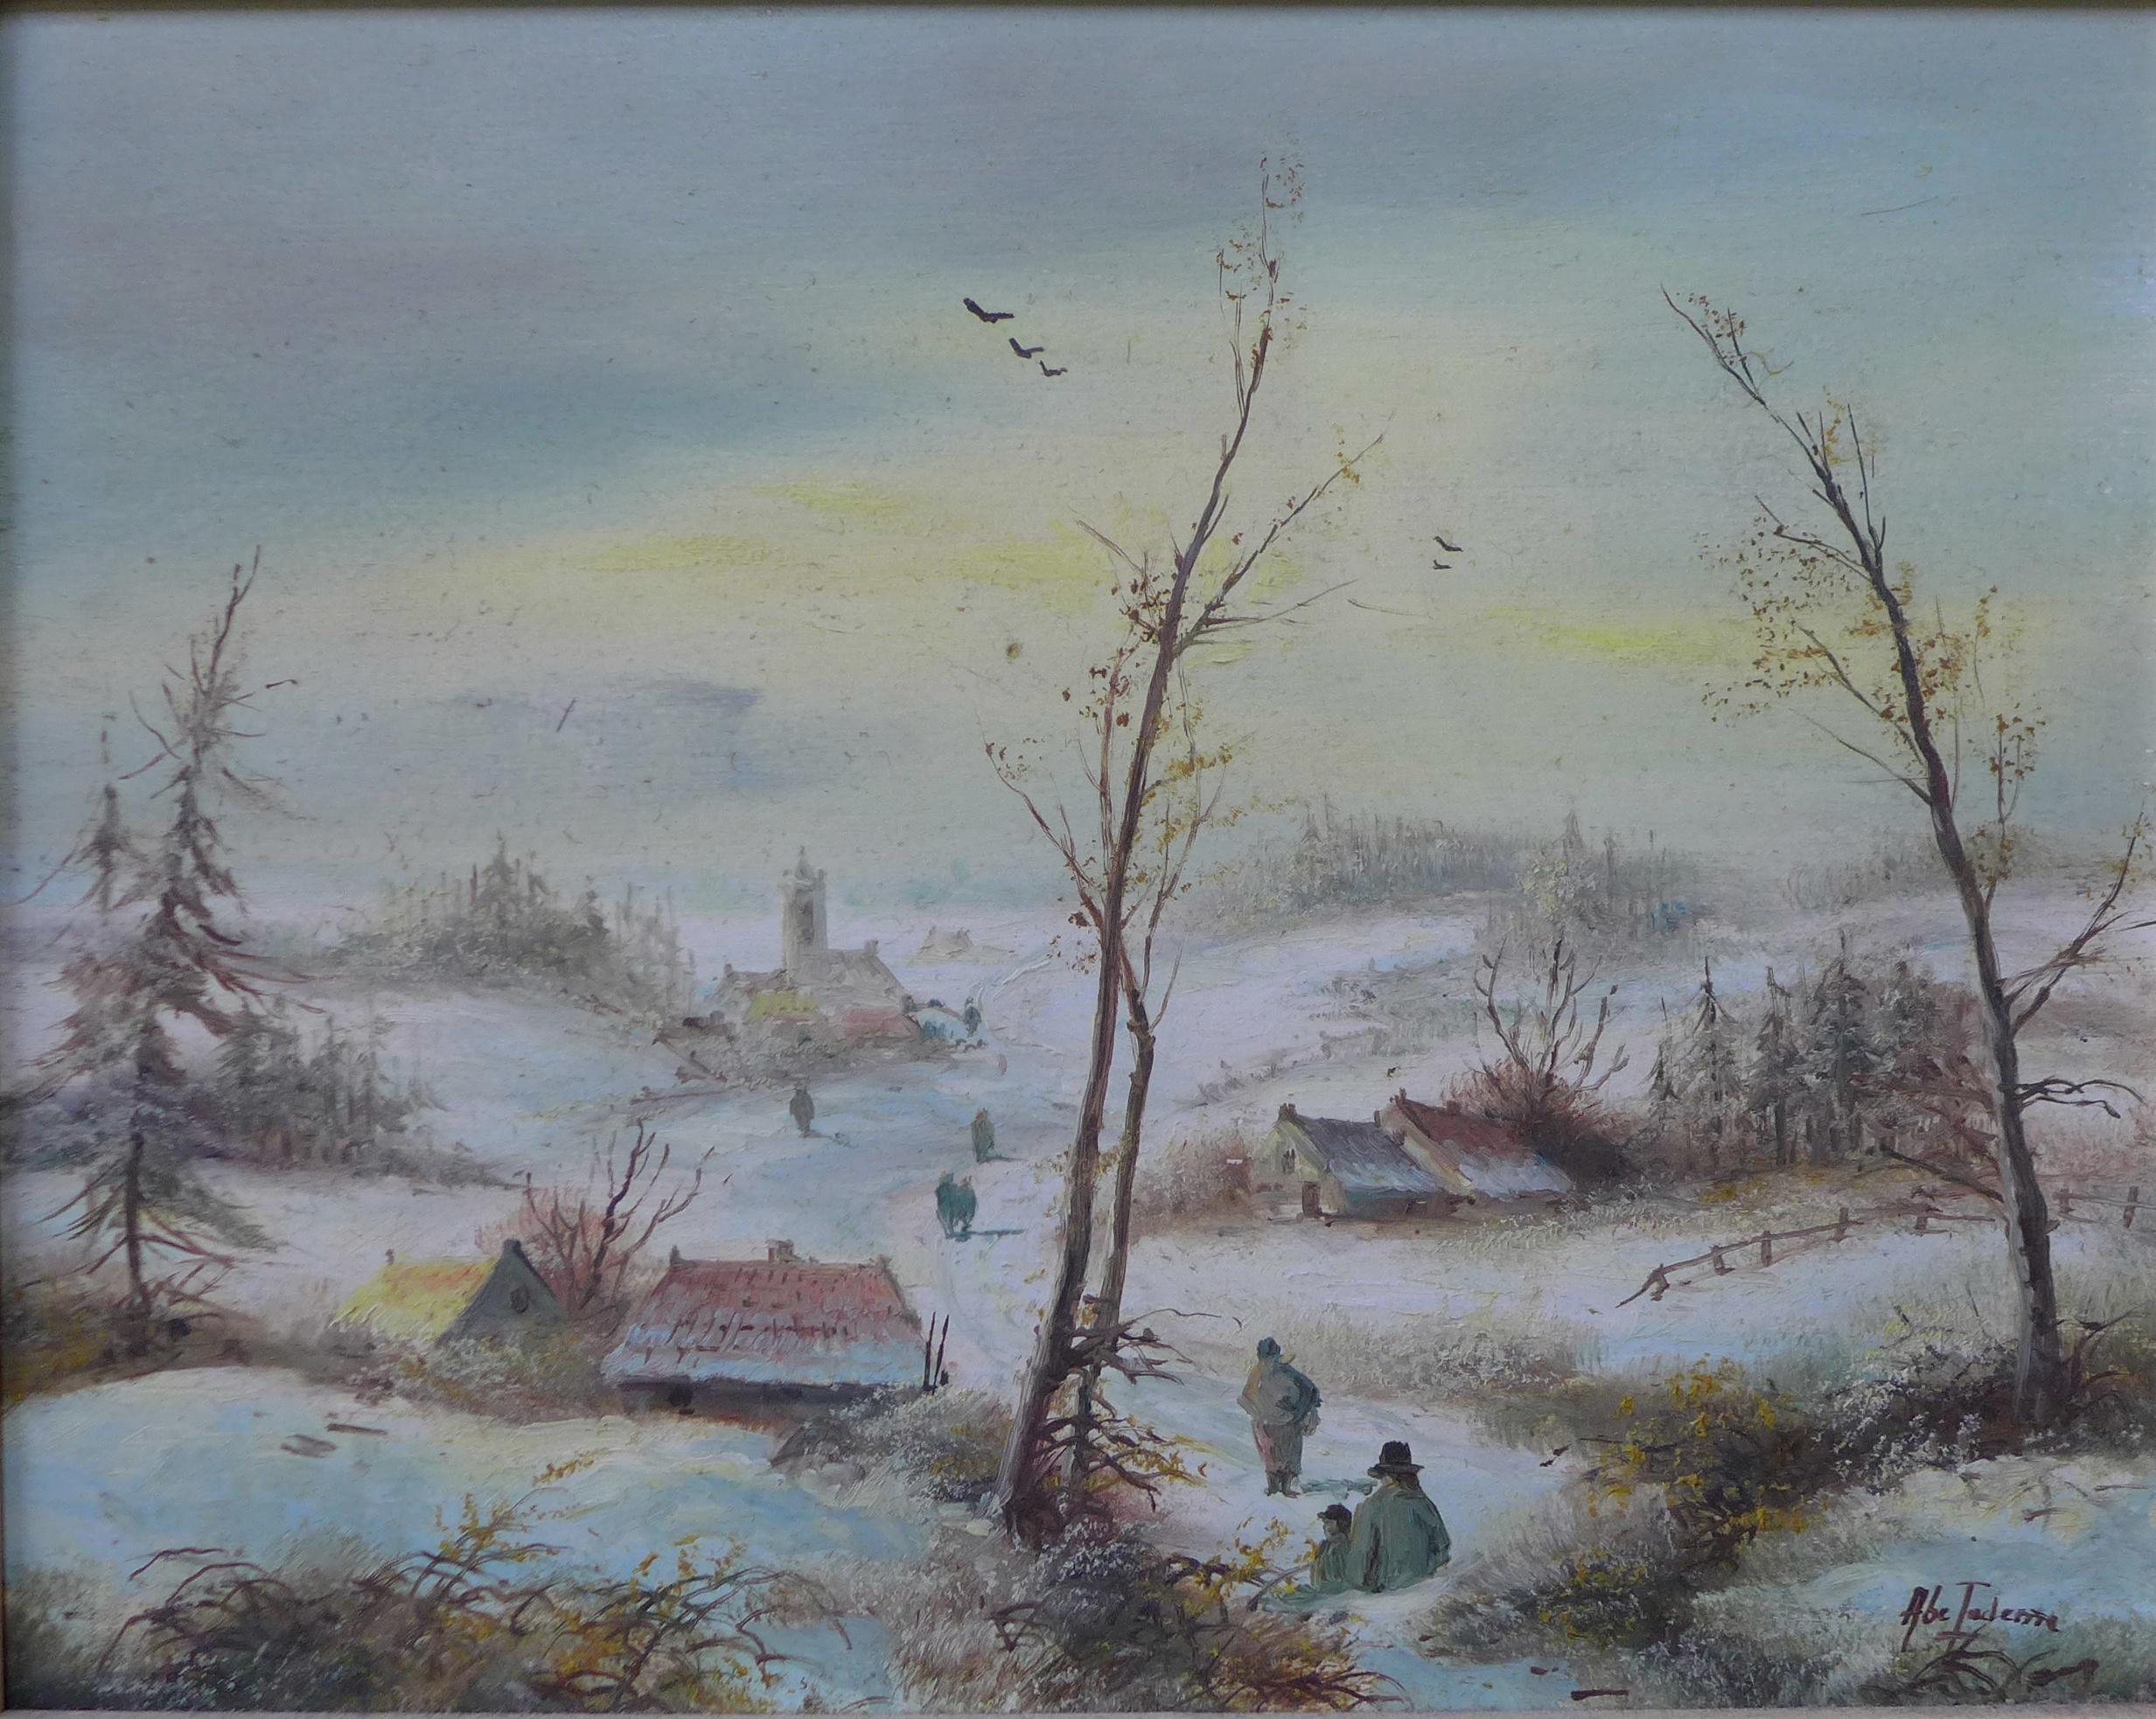 Lot 20 - Abe Tadema, set of three winter landscapes, oil on board, 19 x24cms,